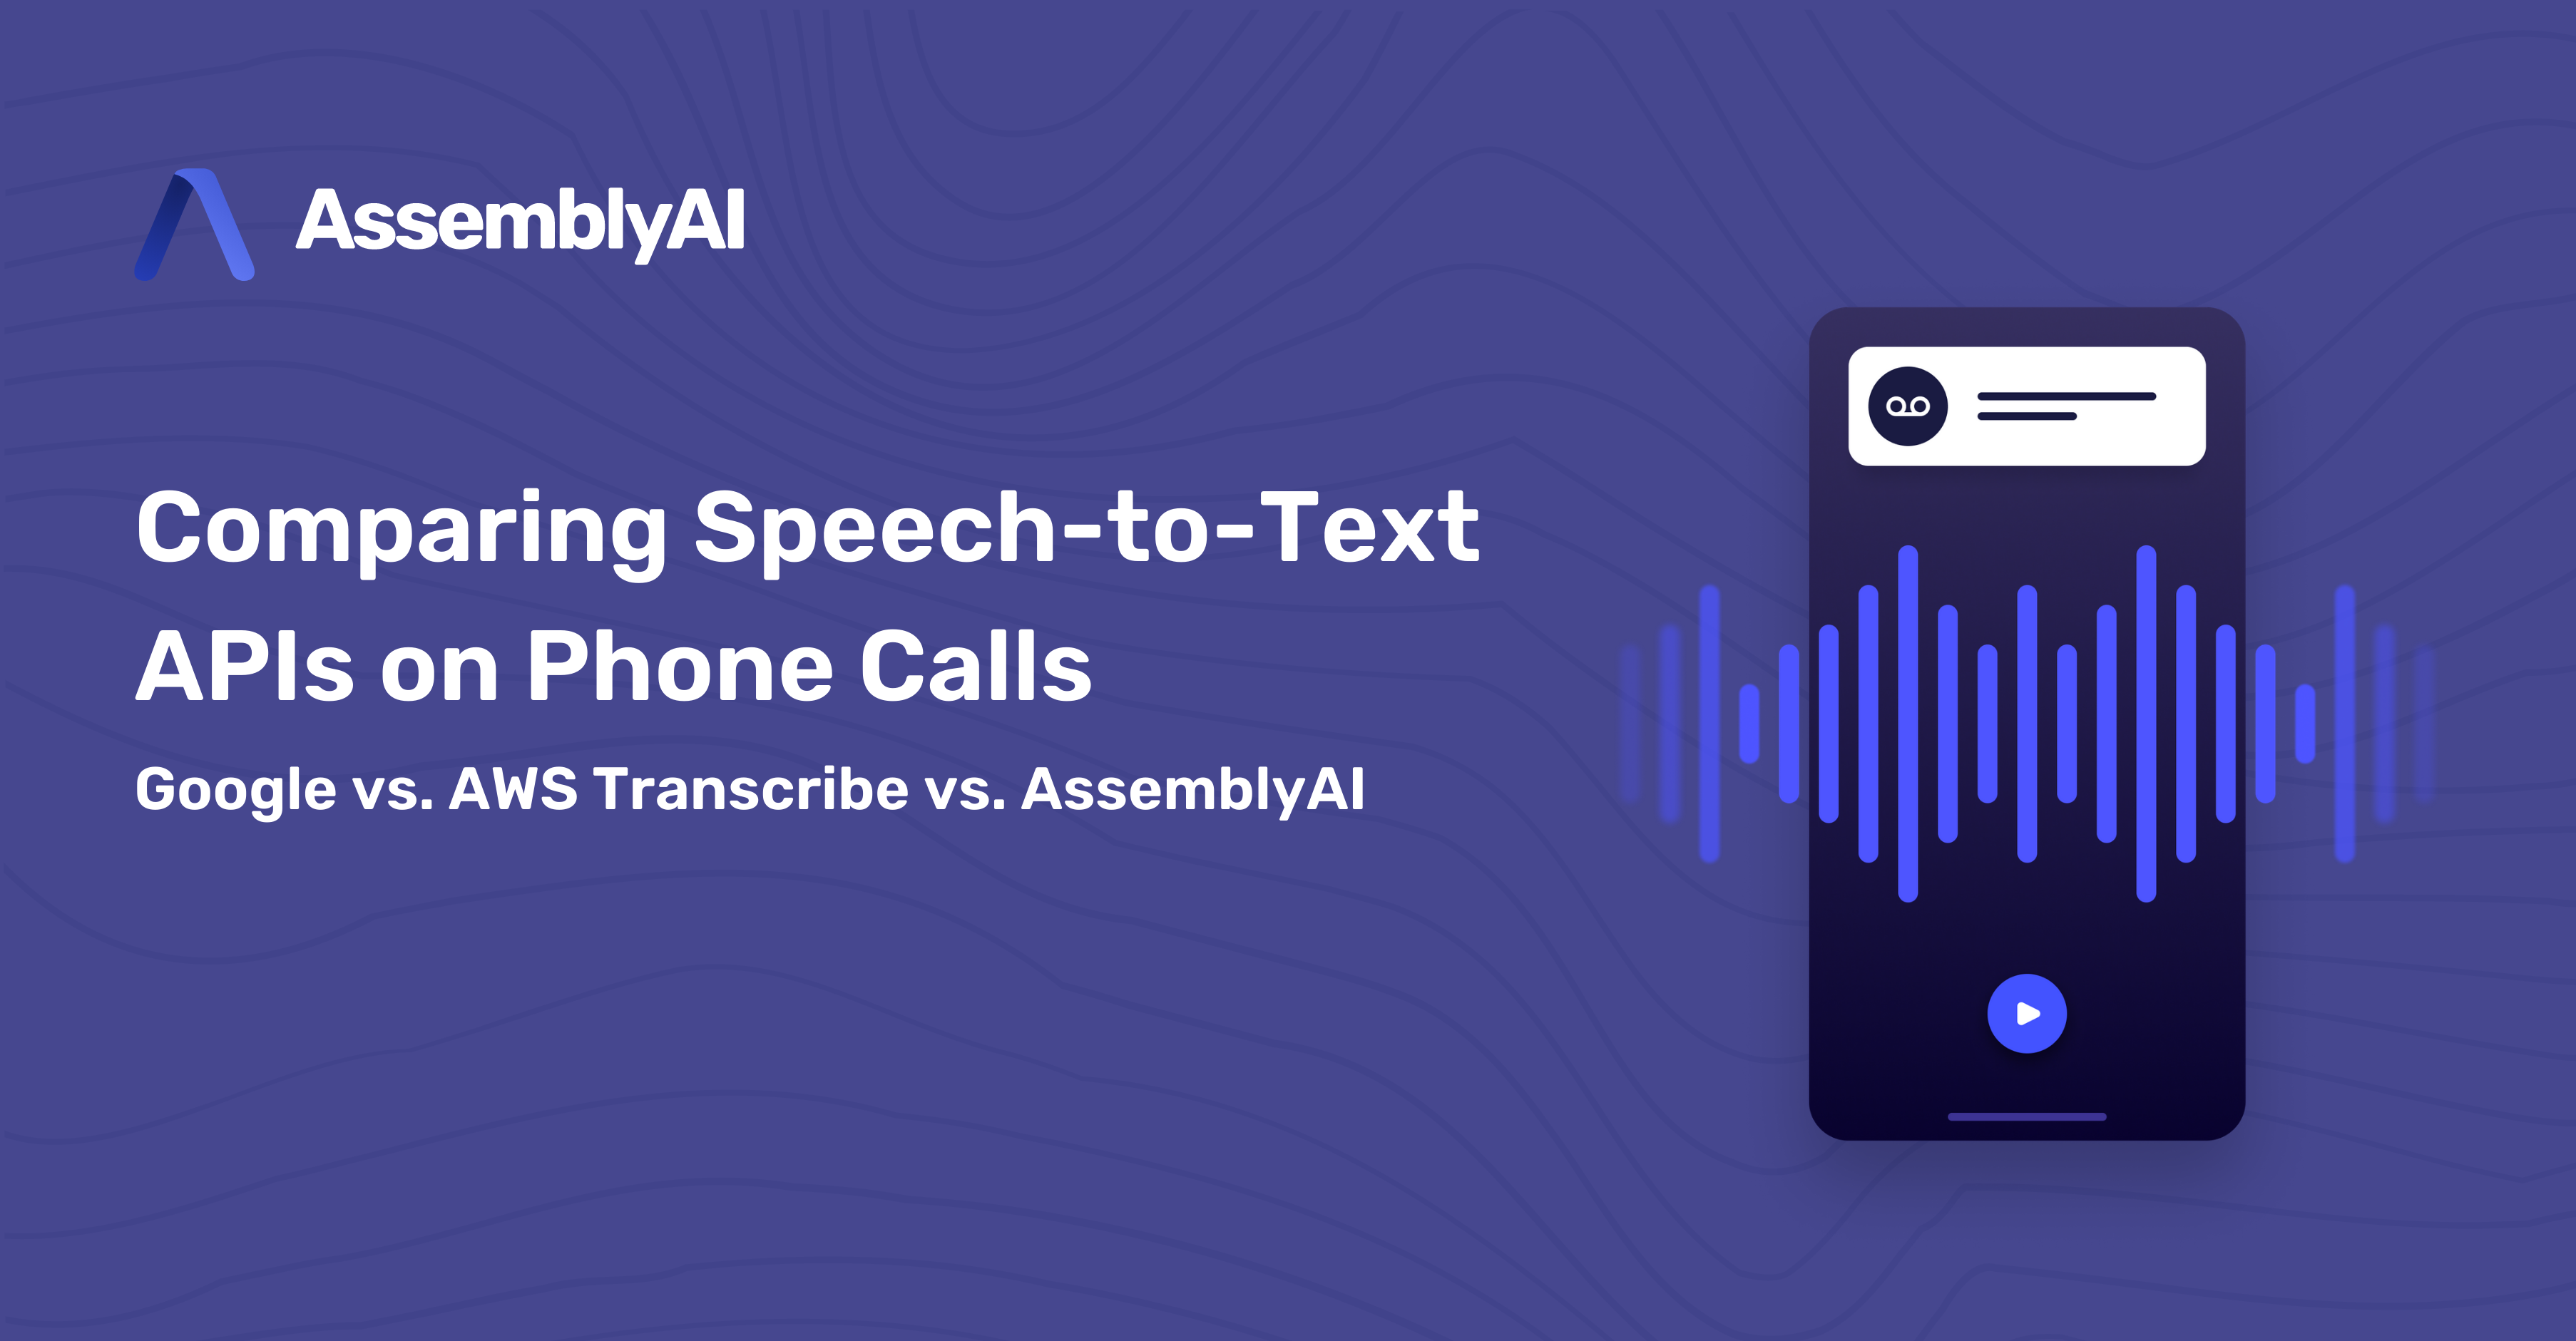 Comparing Speech-to-Text APIs on Phone Calls (Google, AWS Transcribe, AssemblyAI)